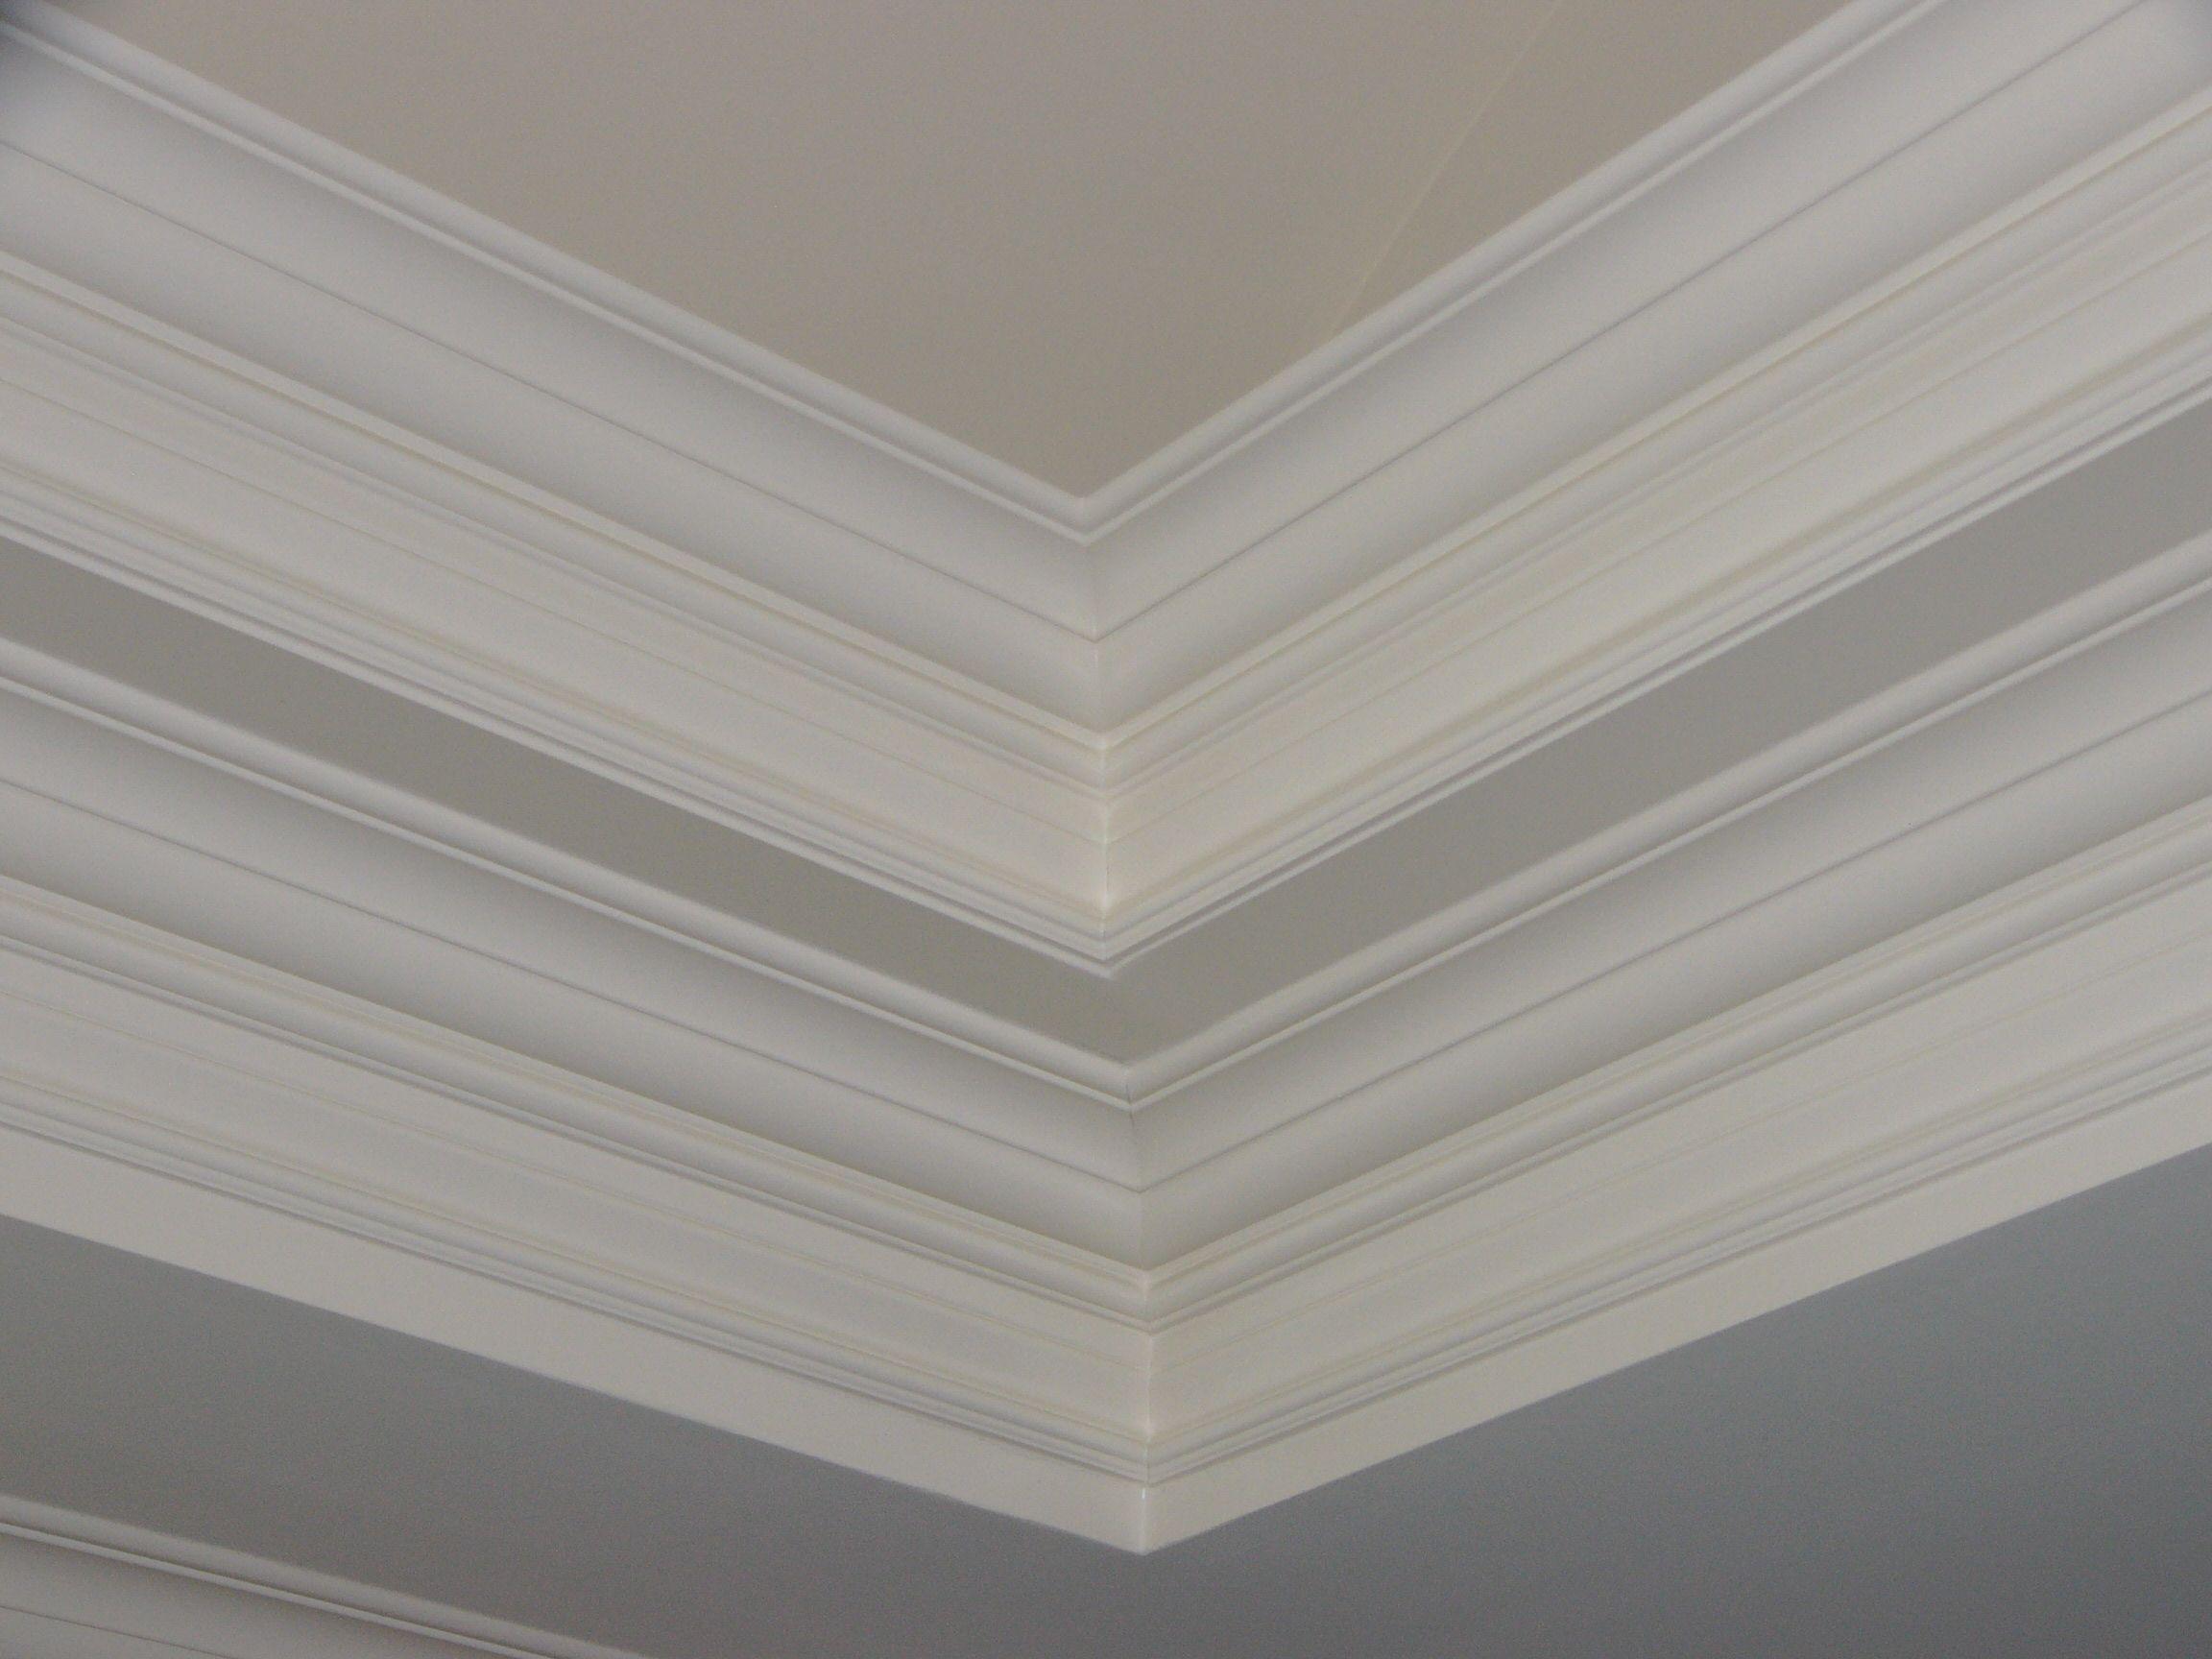 1000+ images about Crown Molding/Architectual Details on Pinterest ...